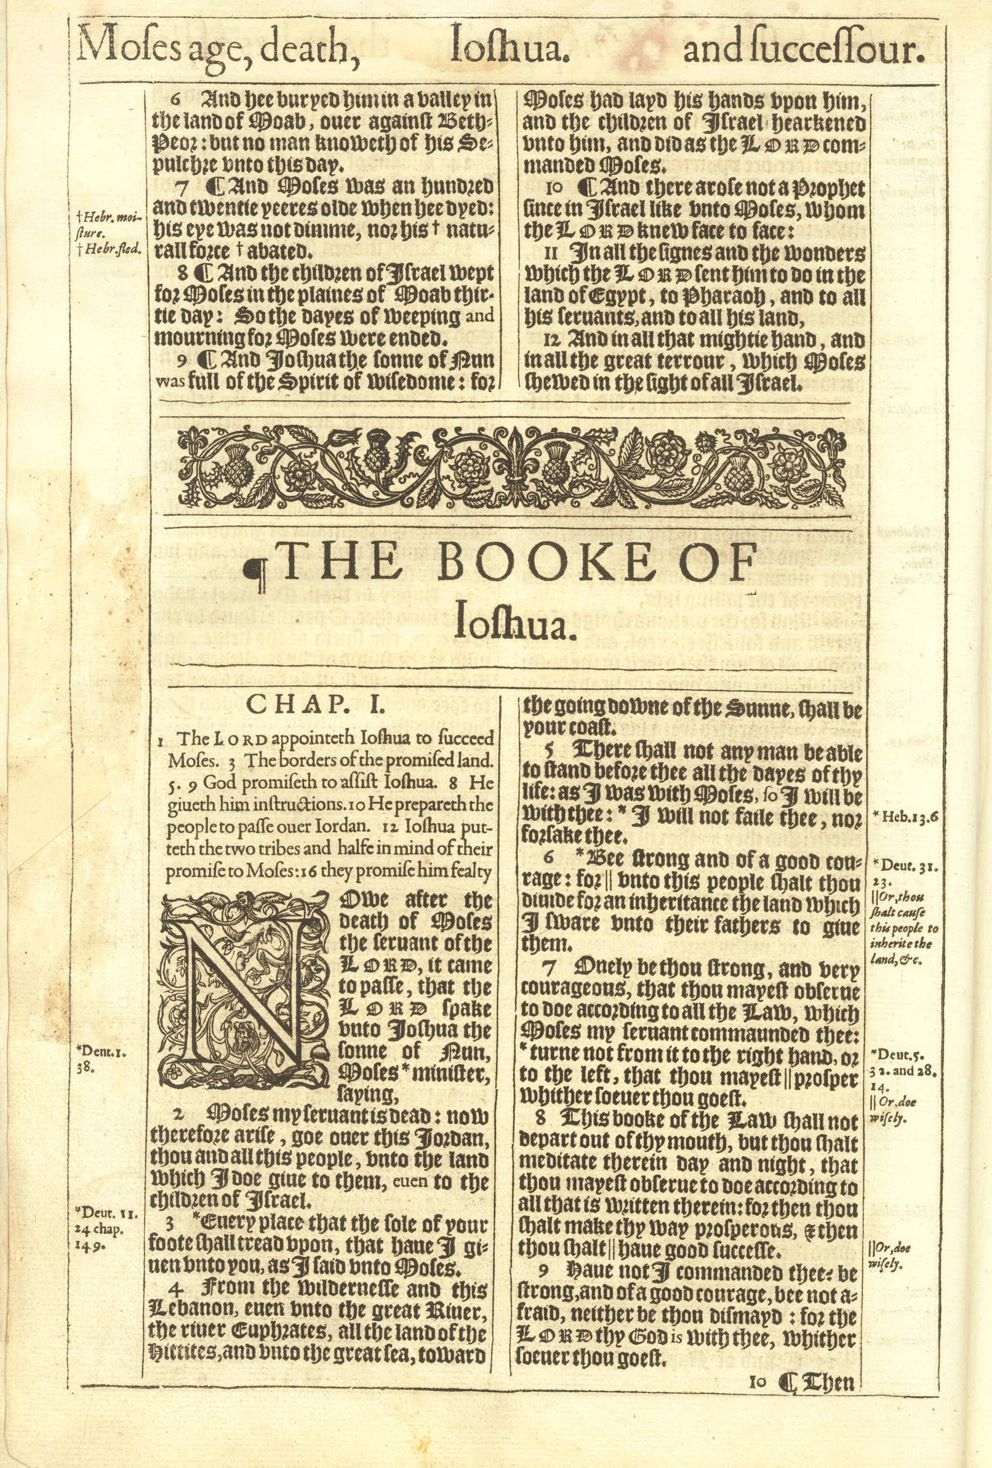 1611 King James Bible First Edition : Joshua Title | KJV